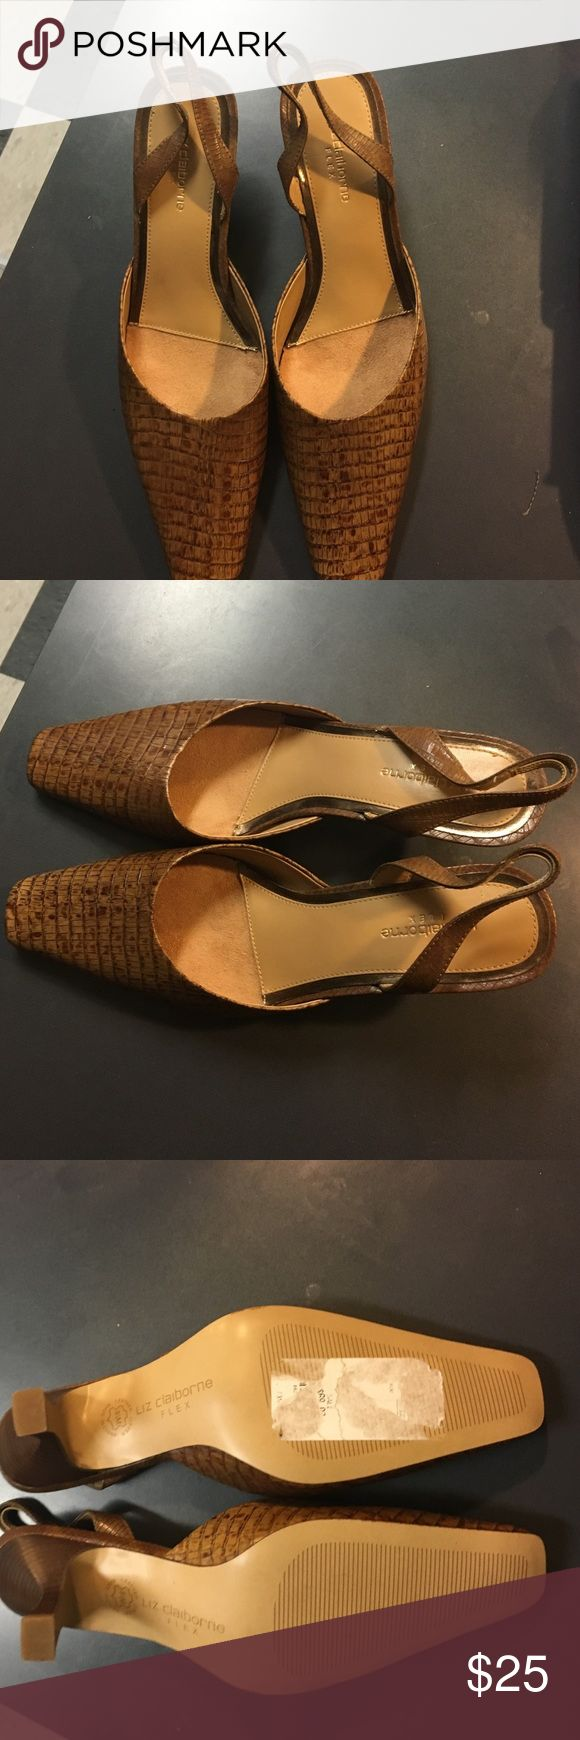 Liz Claiborne flex Liz Claiborne women heels Shoes Heels